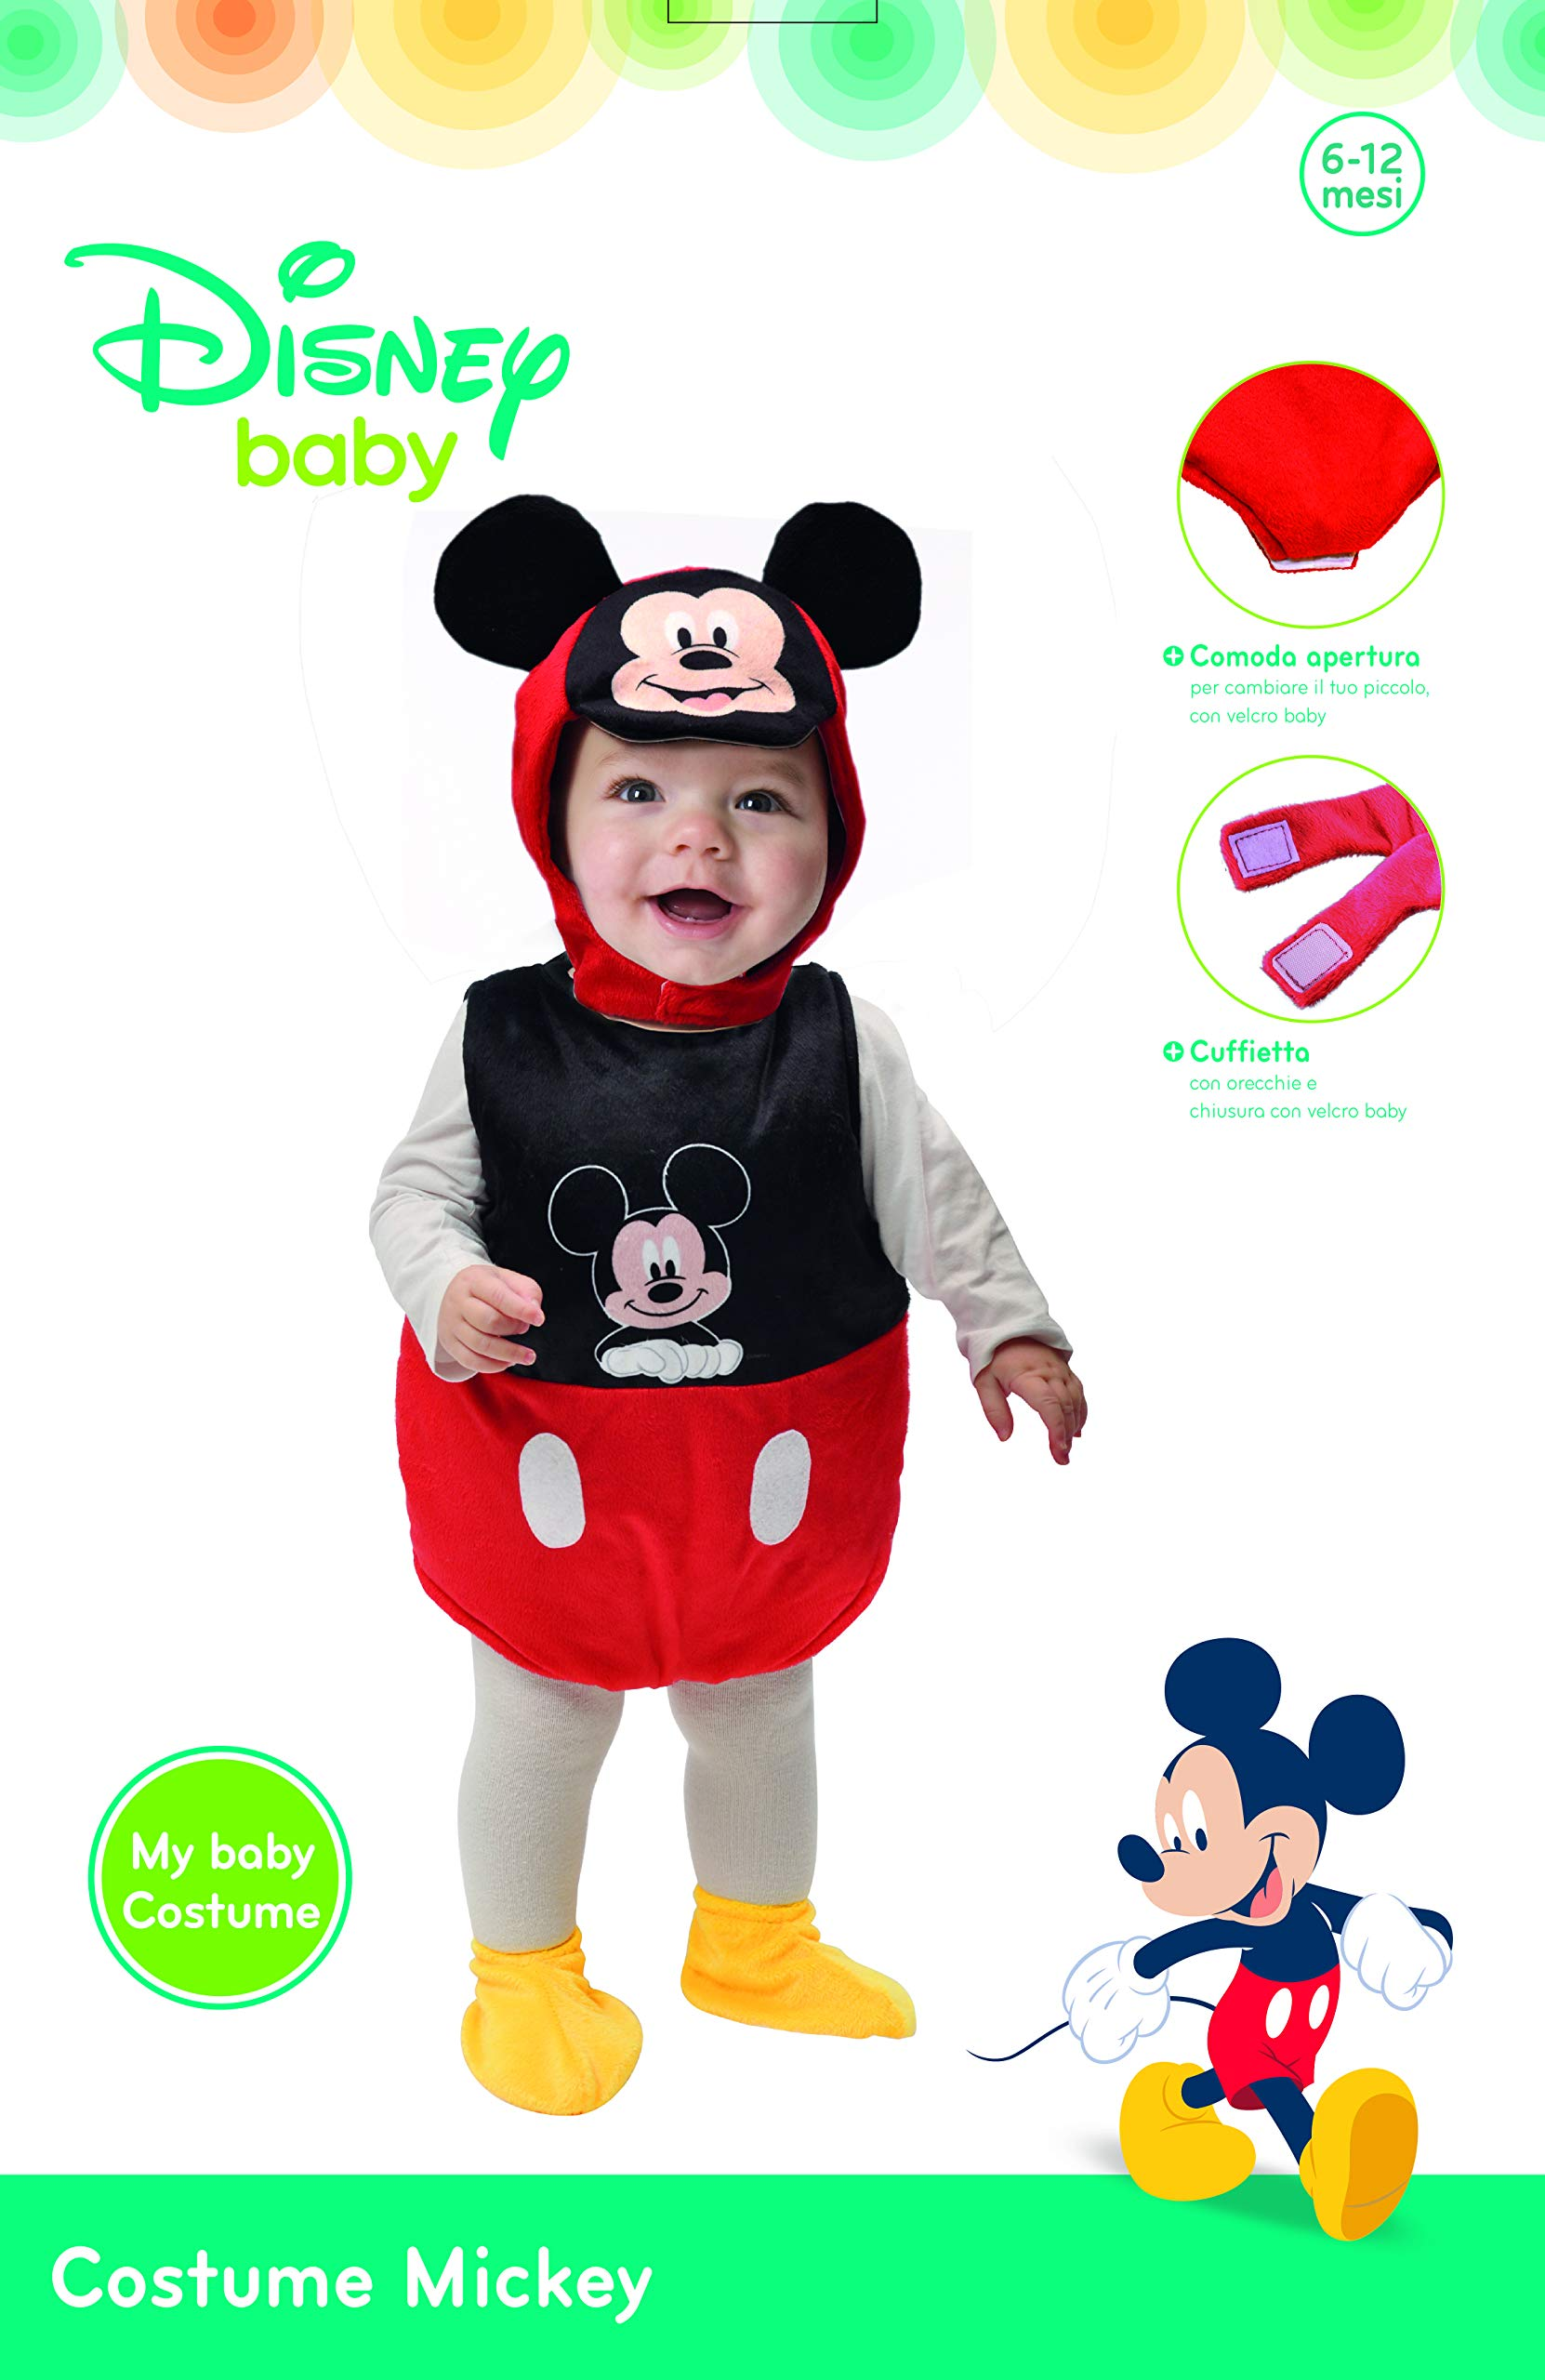 6-12 mesi Disney Costume Baby Dalmata 101 Bianco Ciao 11246.6-12